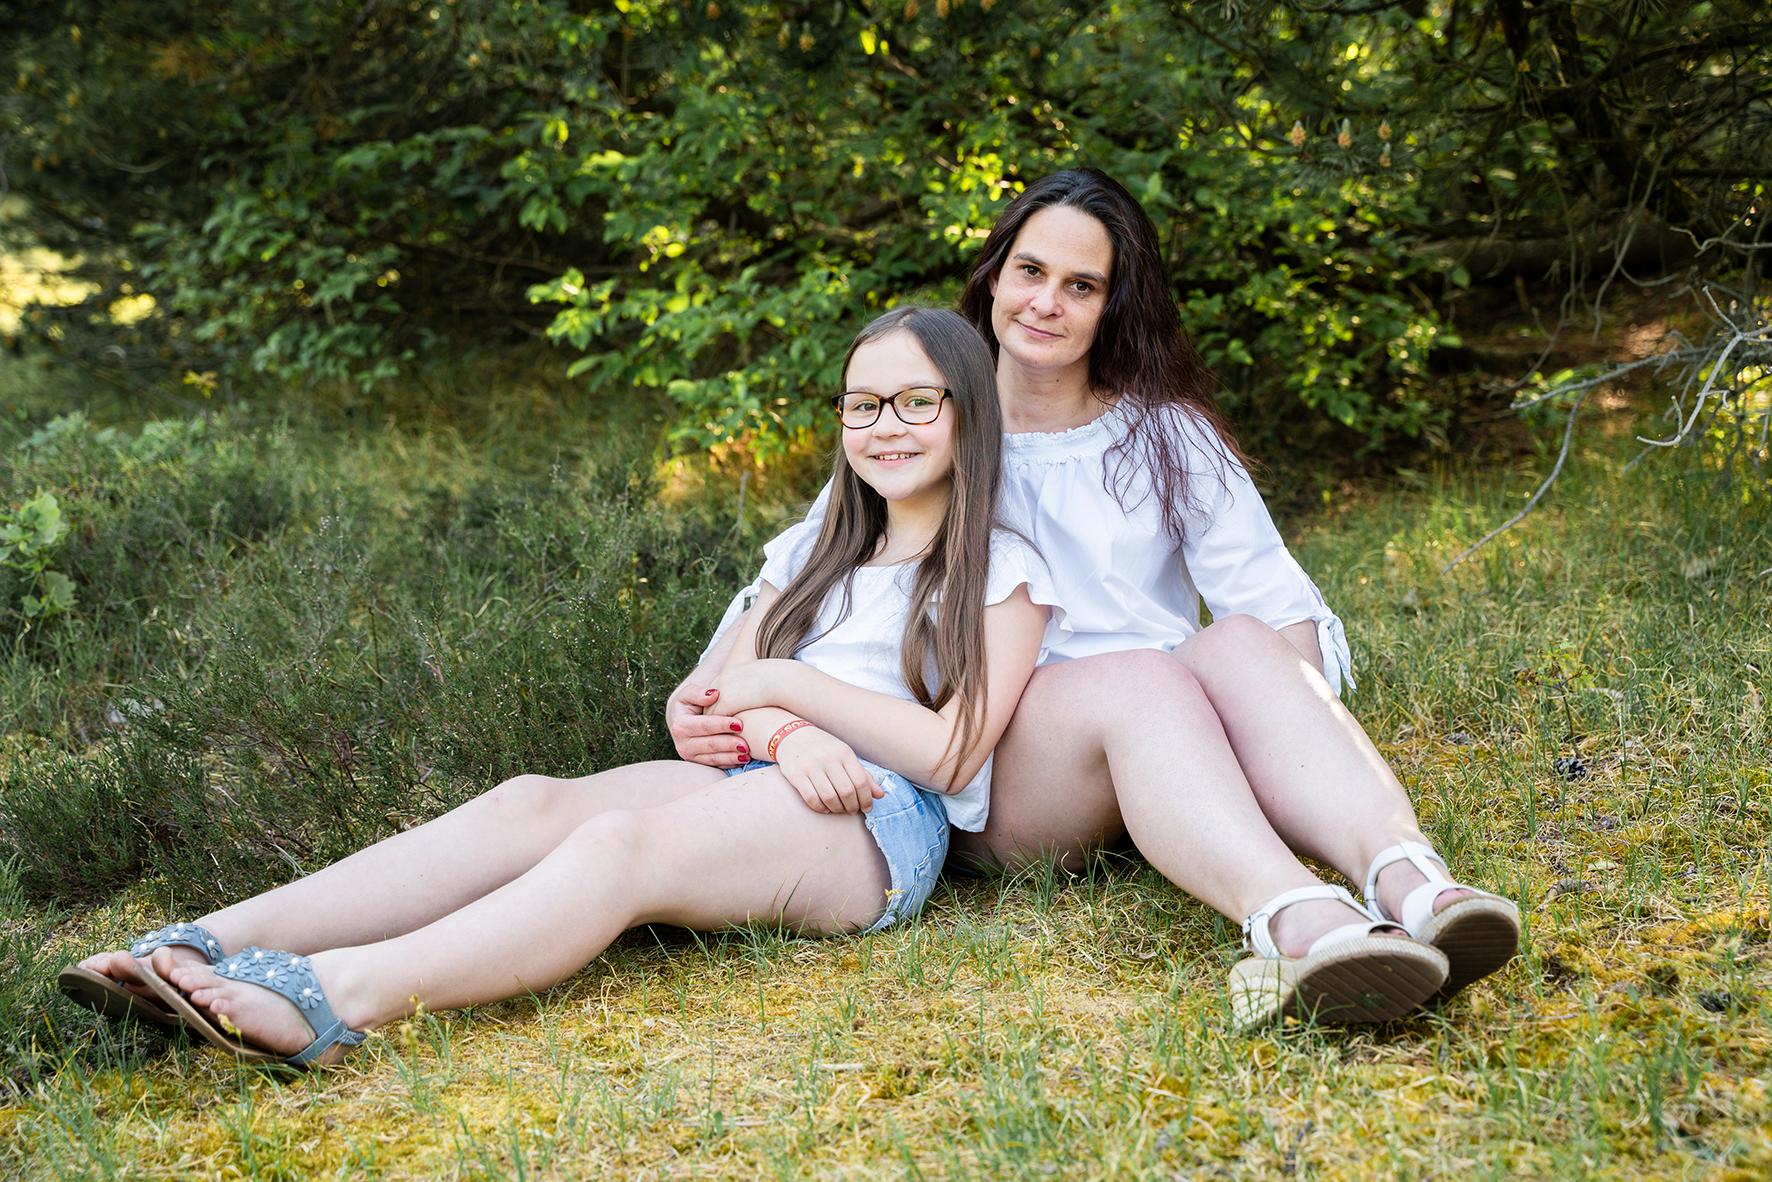 Mutter und Tochter Fotoshooting Familienshooting Bremen Fotograf Lilienthal